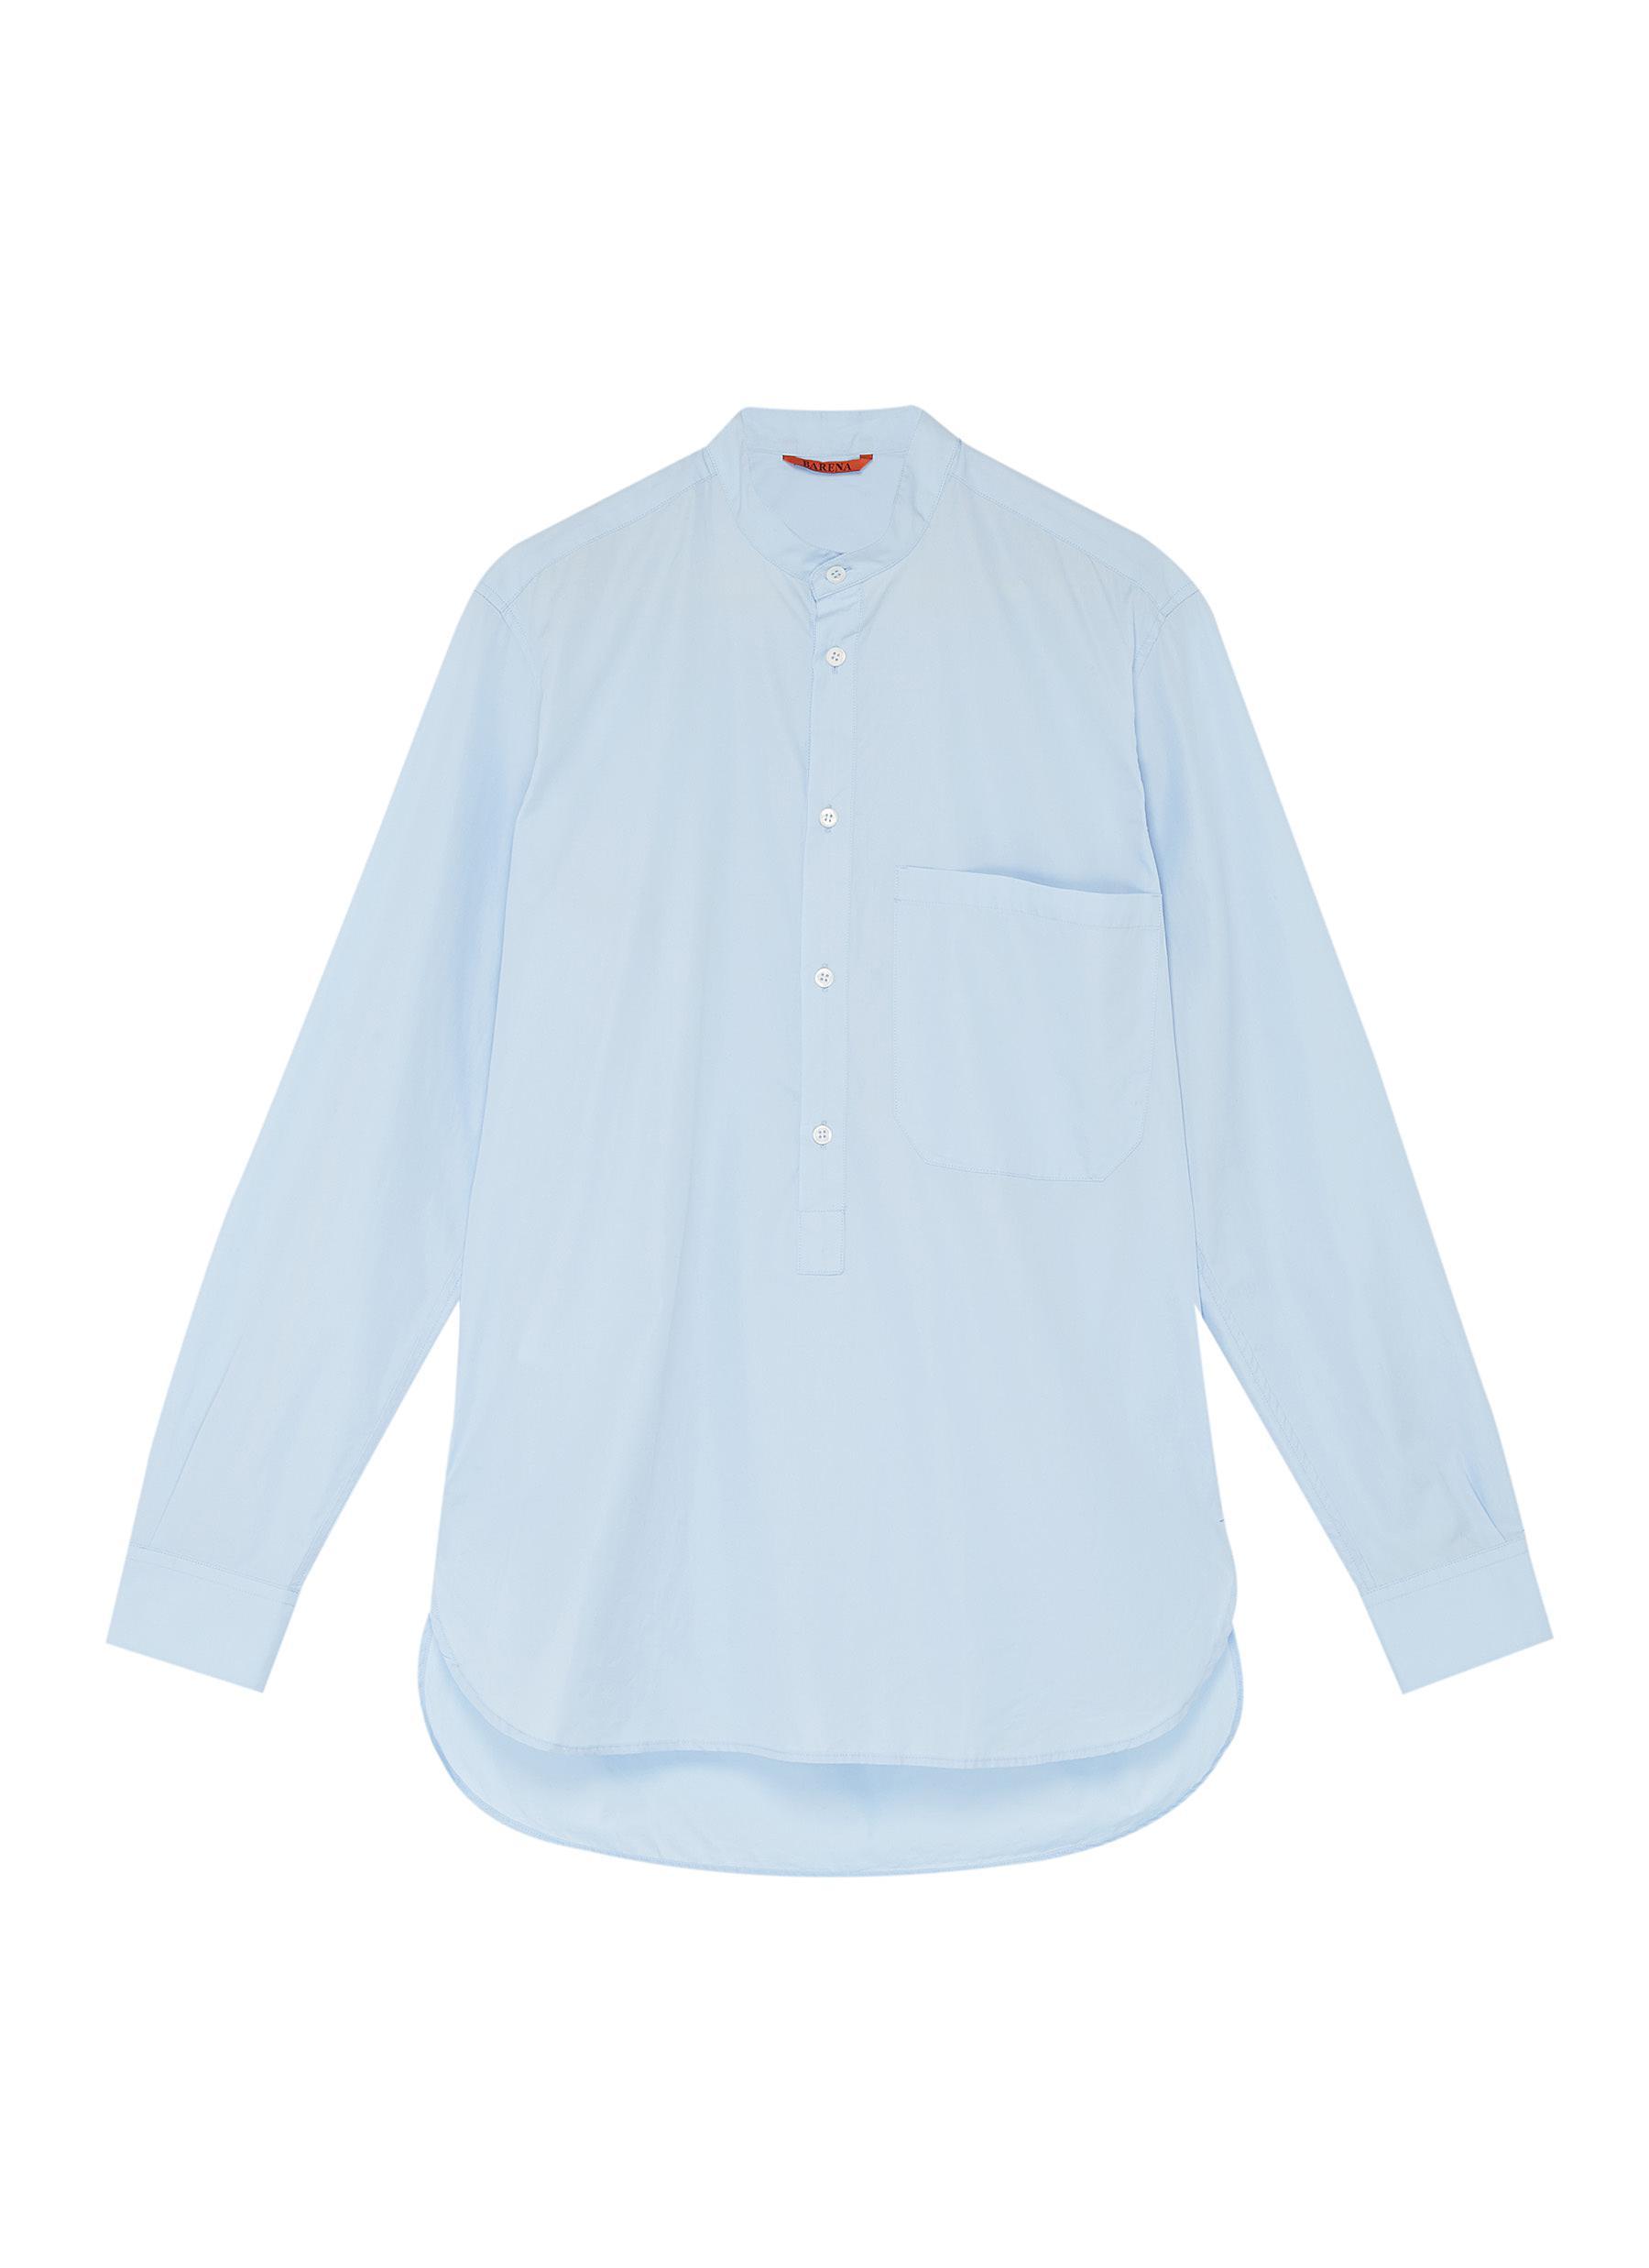 Barena Venezia Mandarin Collar Half Button Placket Shirt